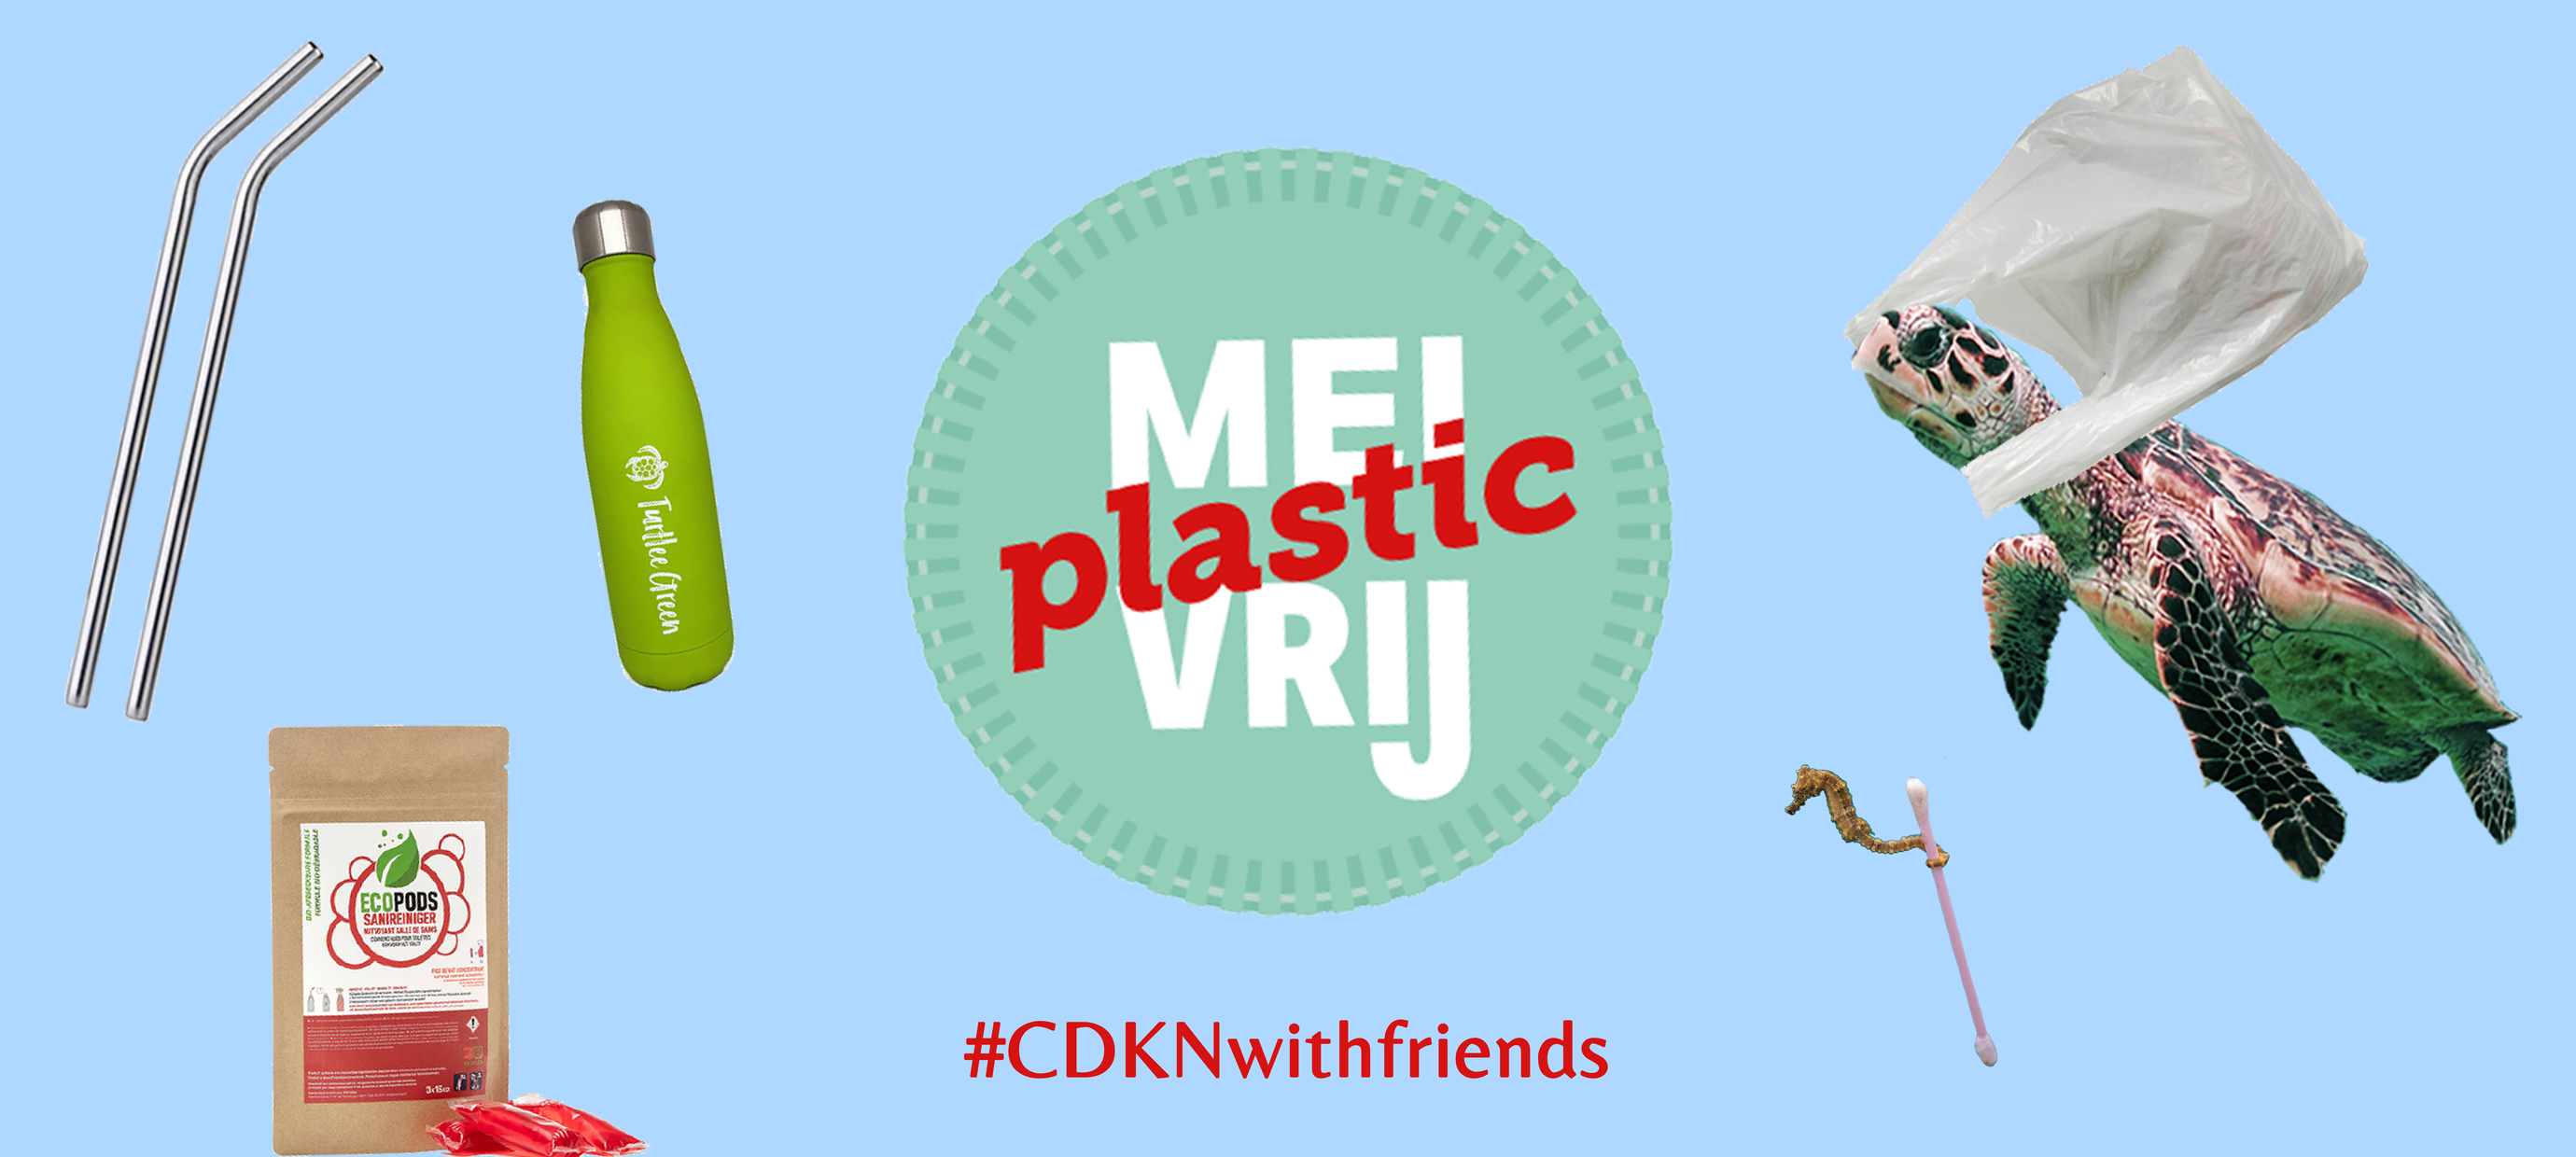 Mei Plasticvrij: 3 tips